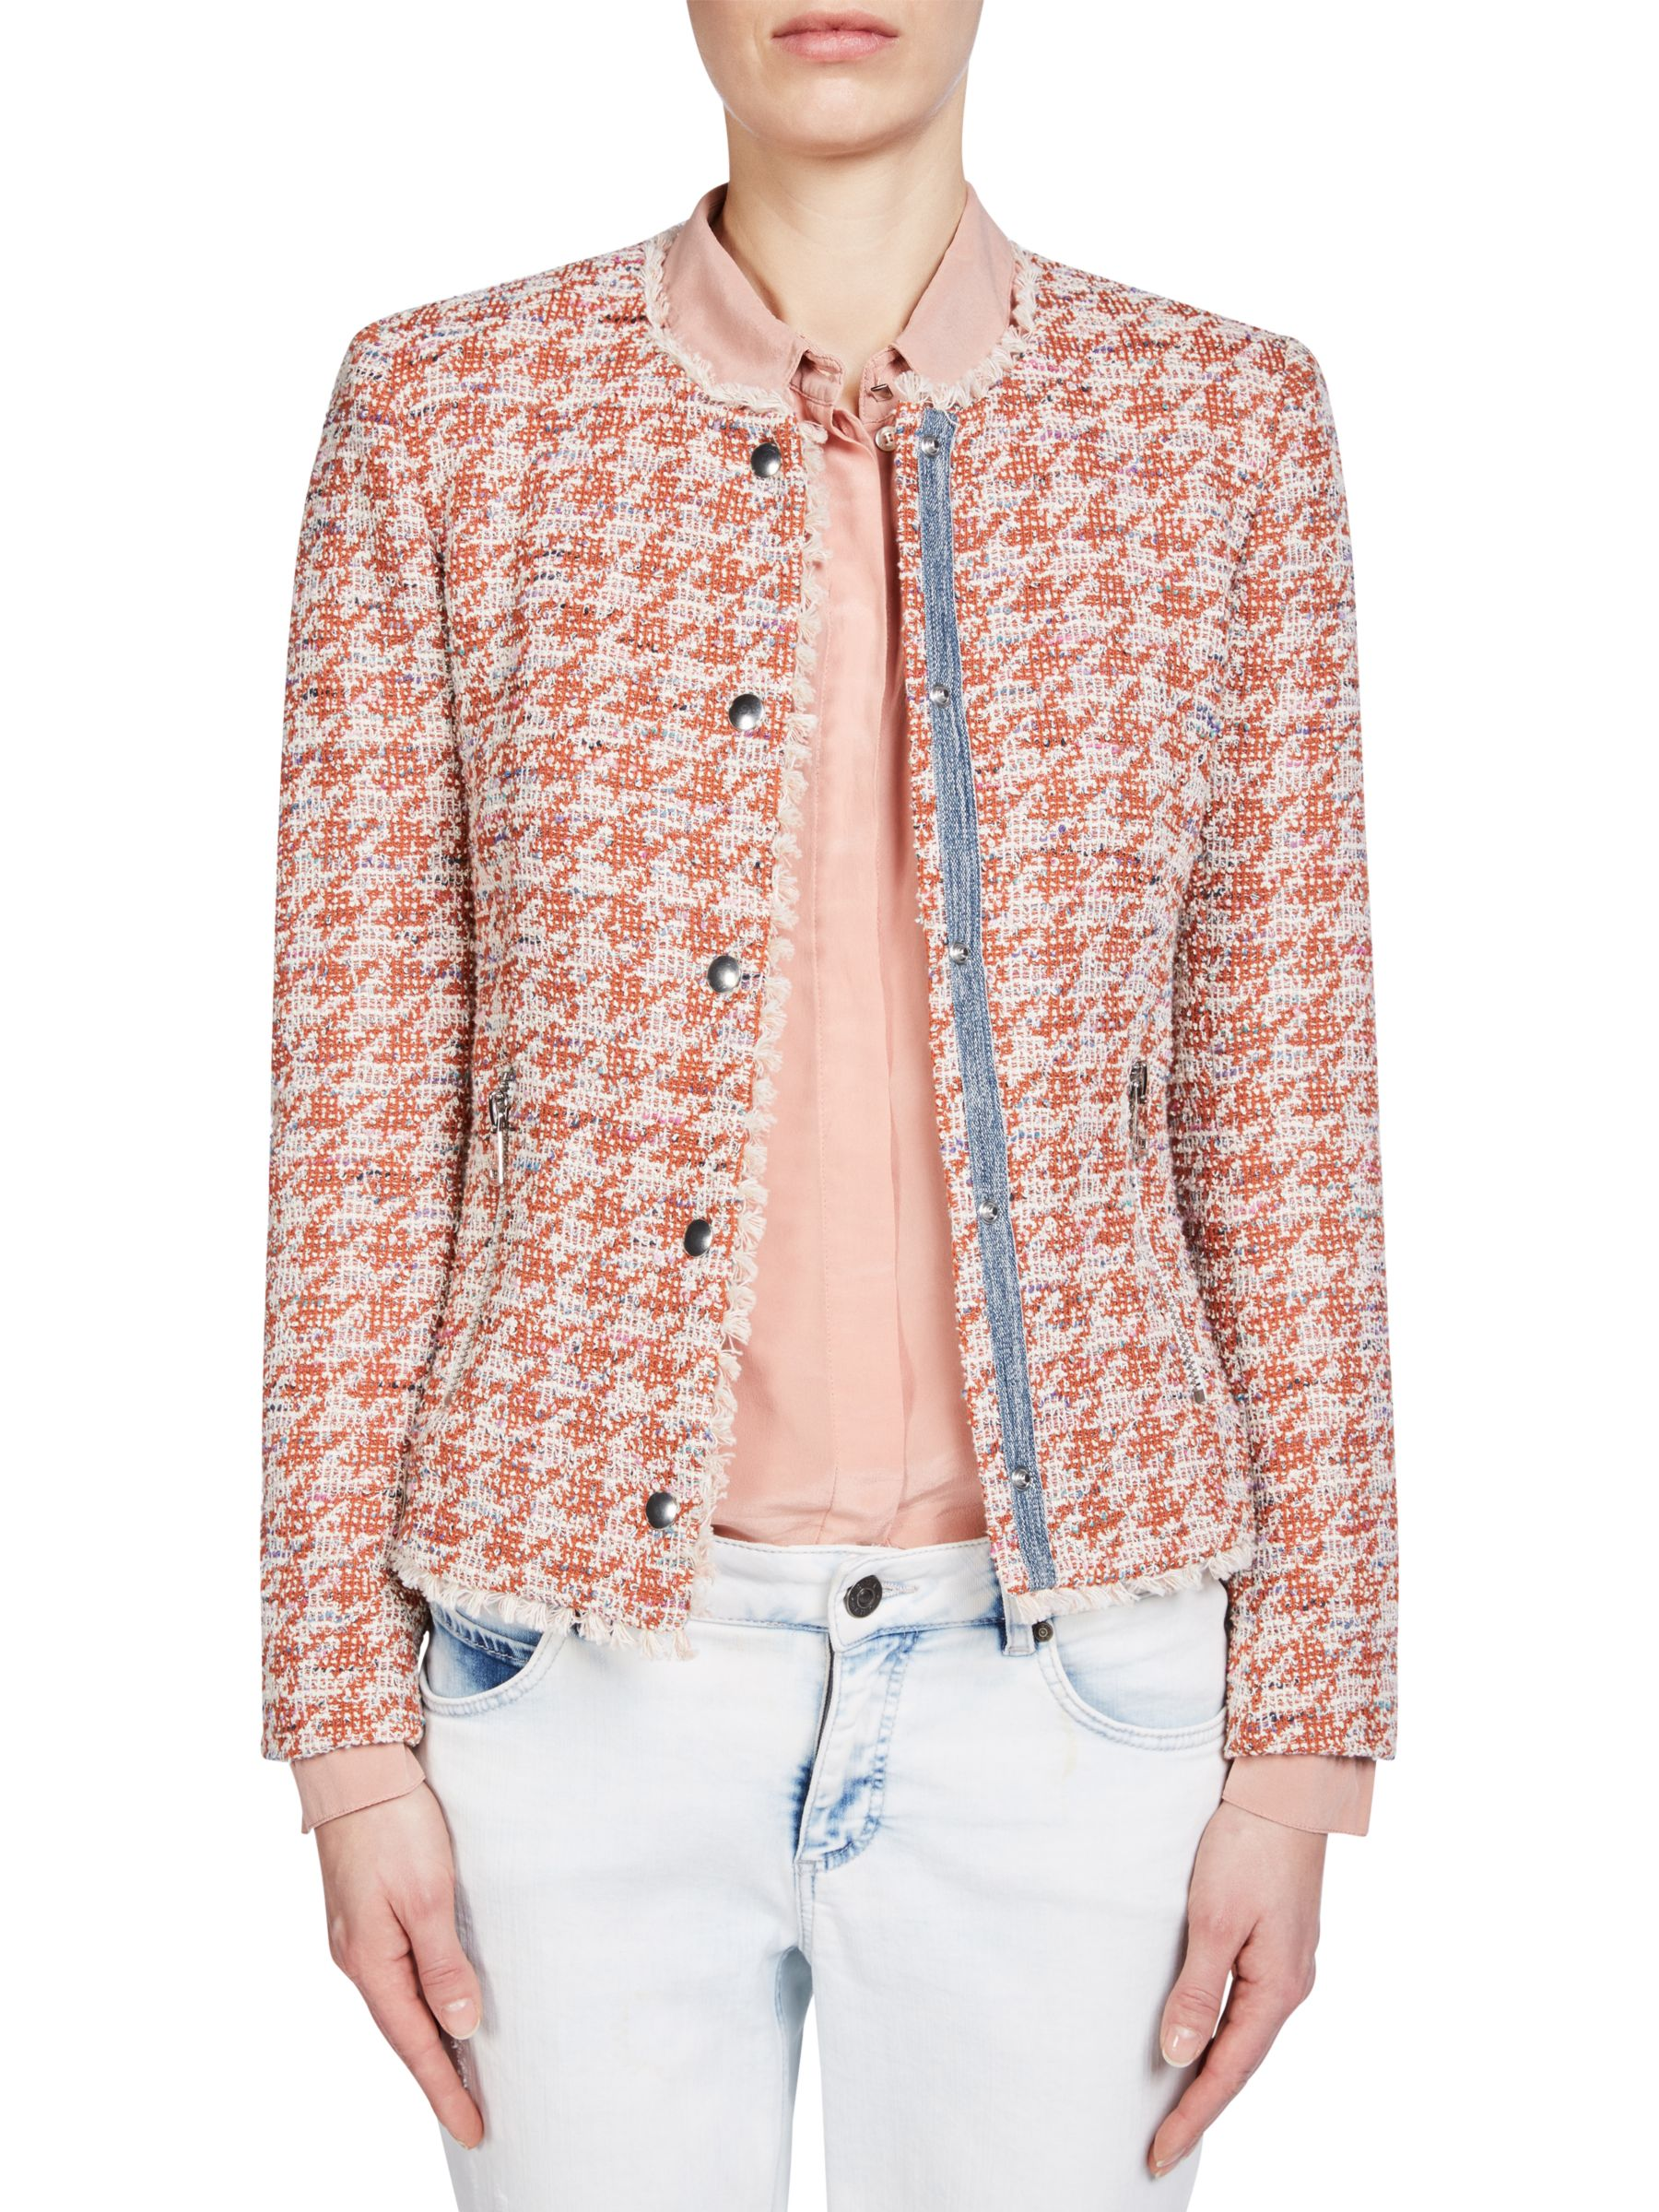 Oui Oui Tweed Jacket, Red/Off White